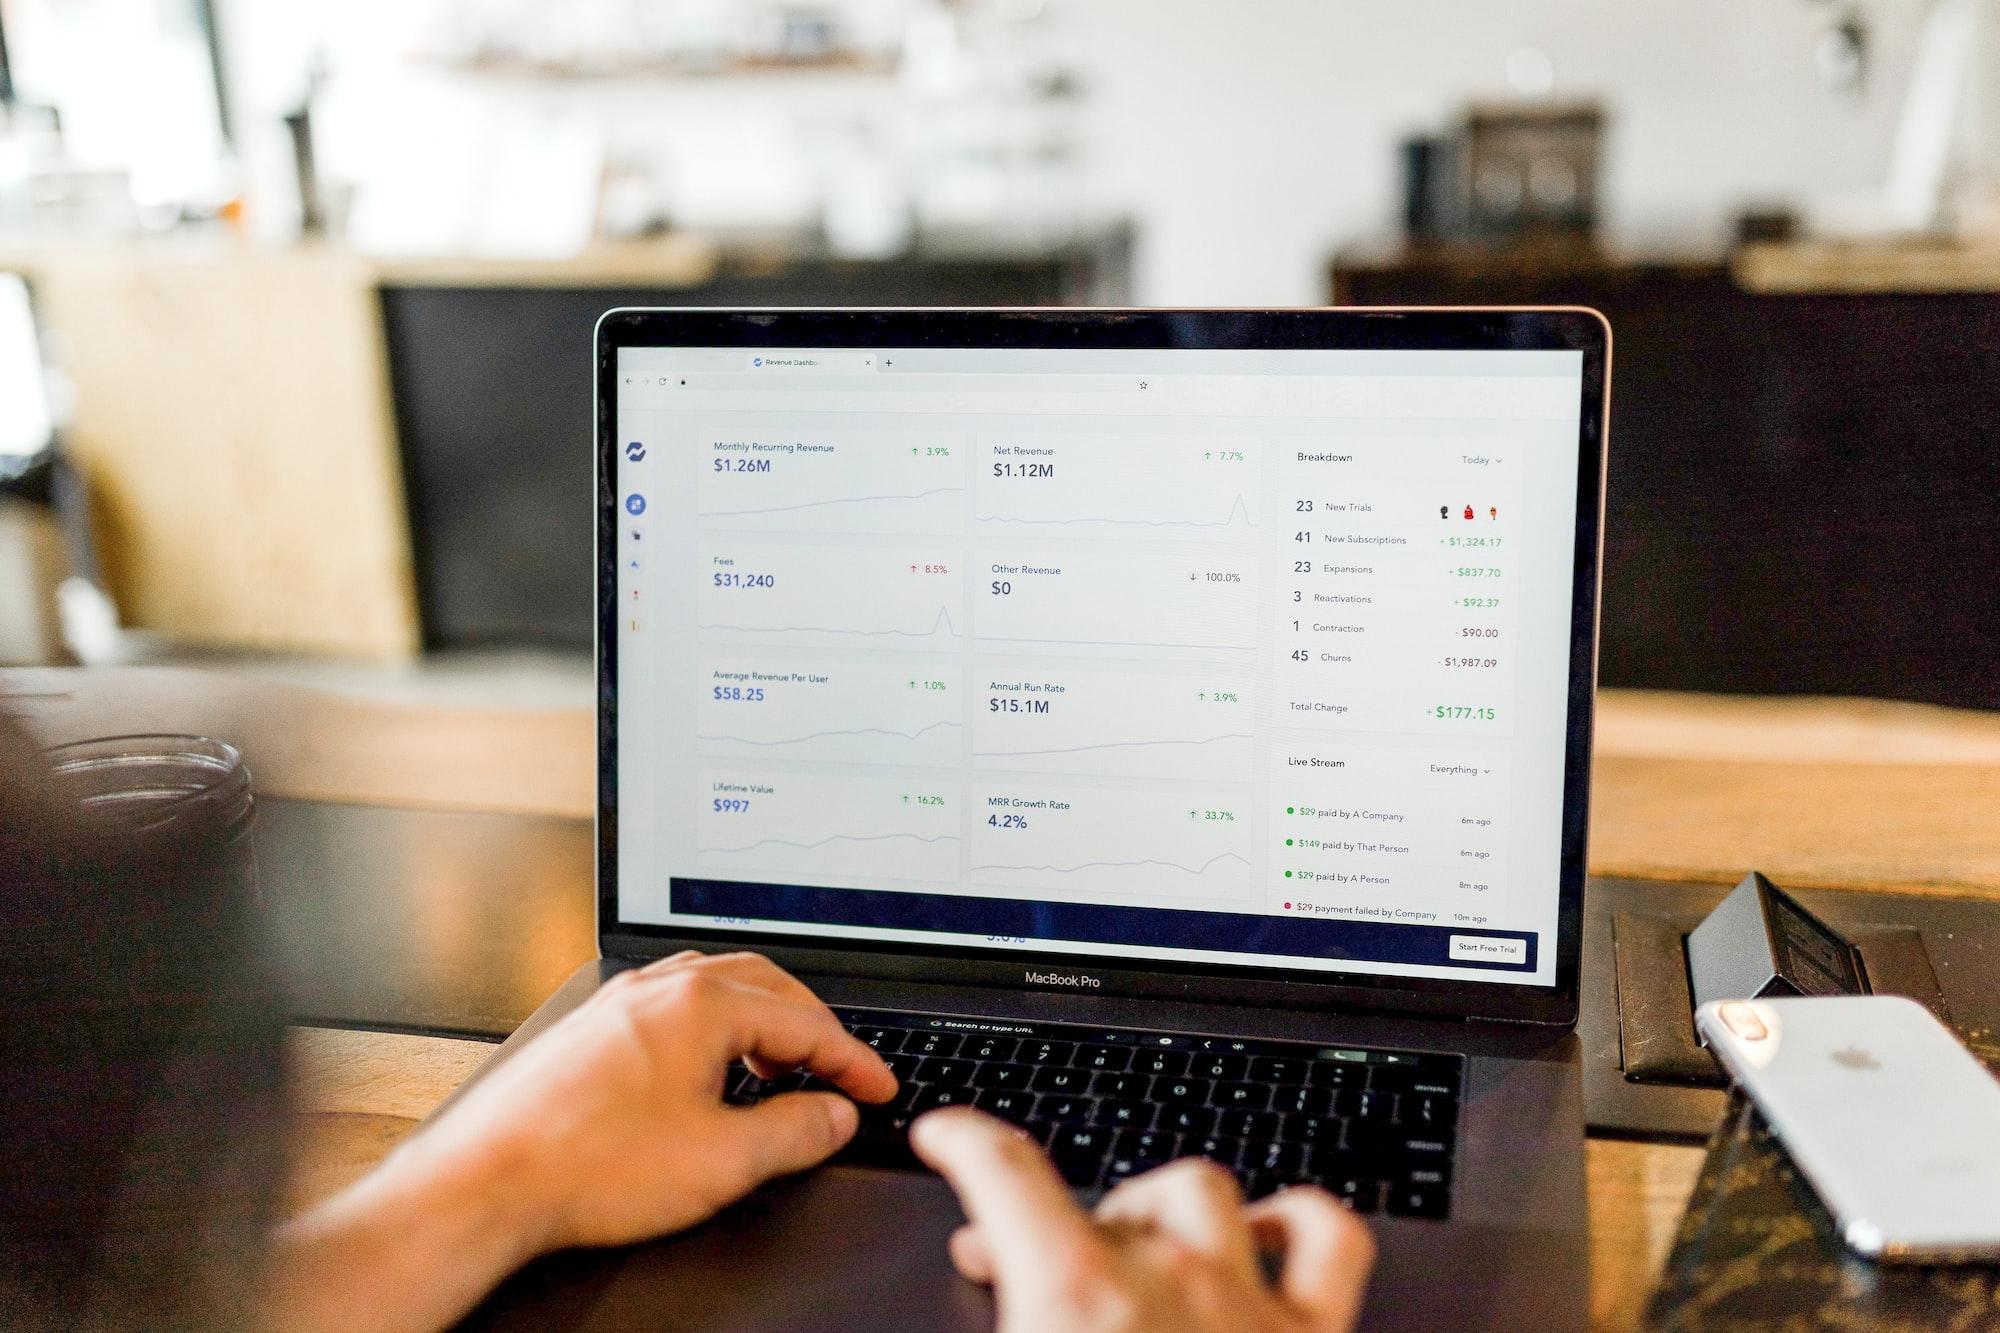 13 Best eCommerce Platforms for Startups in 2021 (Including Pricing)